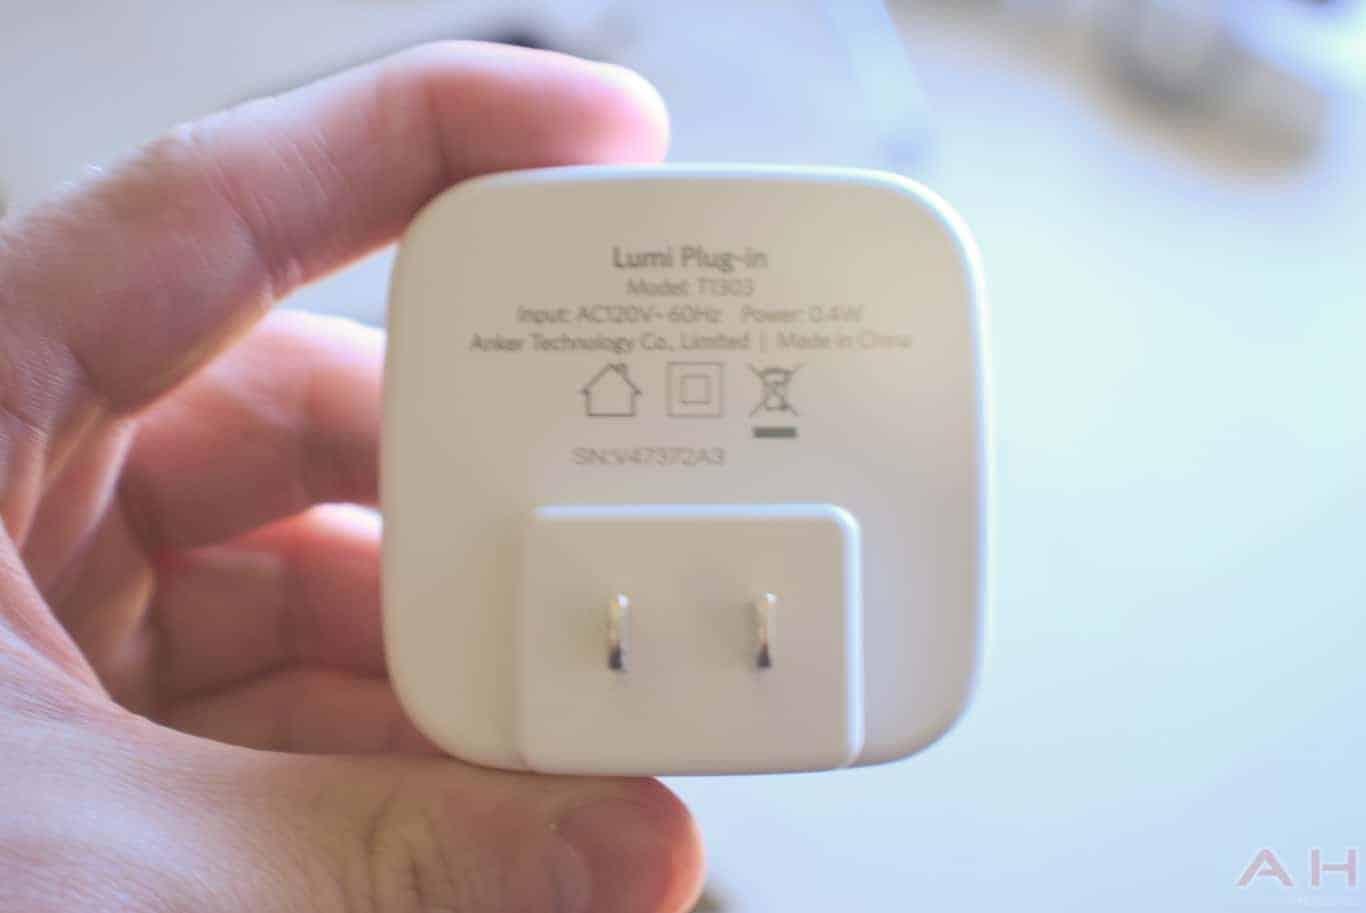 Eufy Lumi Plug In Night Light AM AH 0015